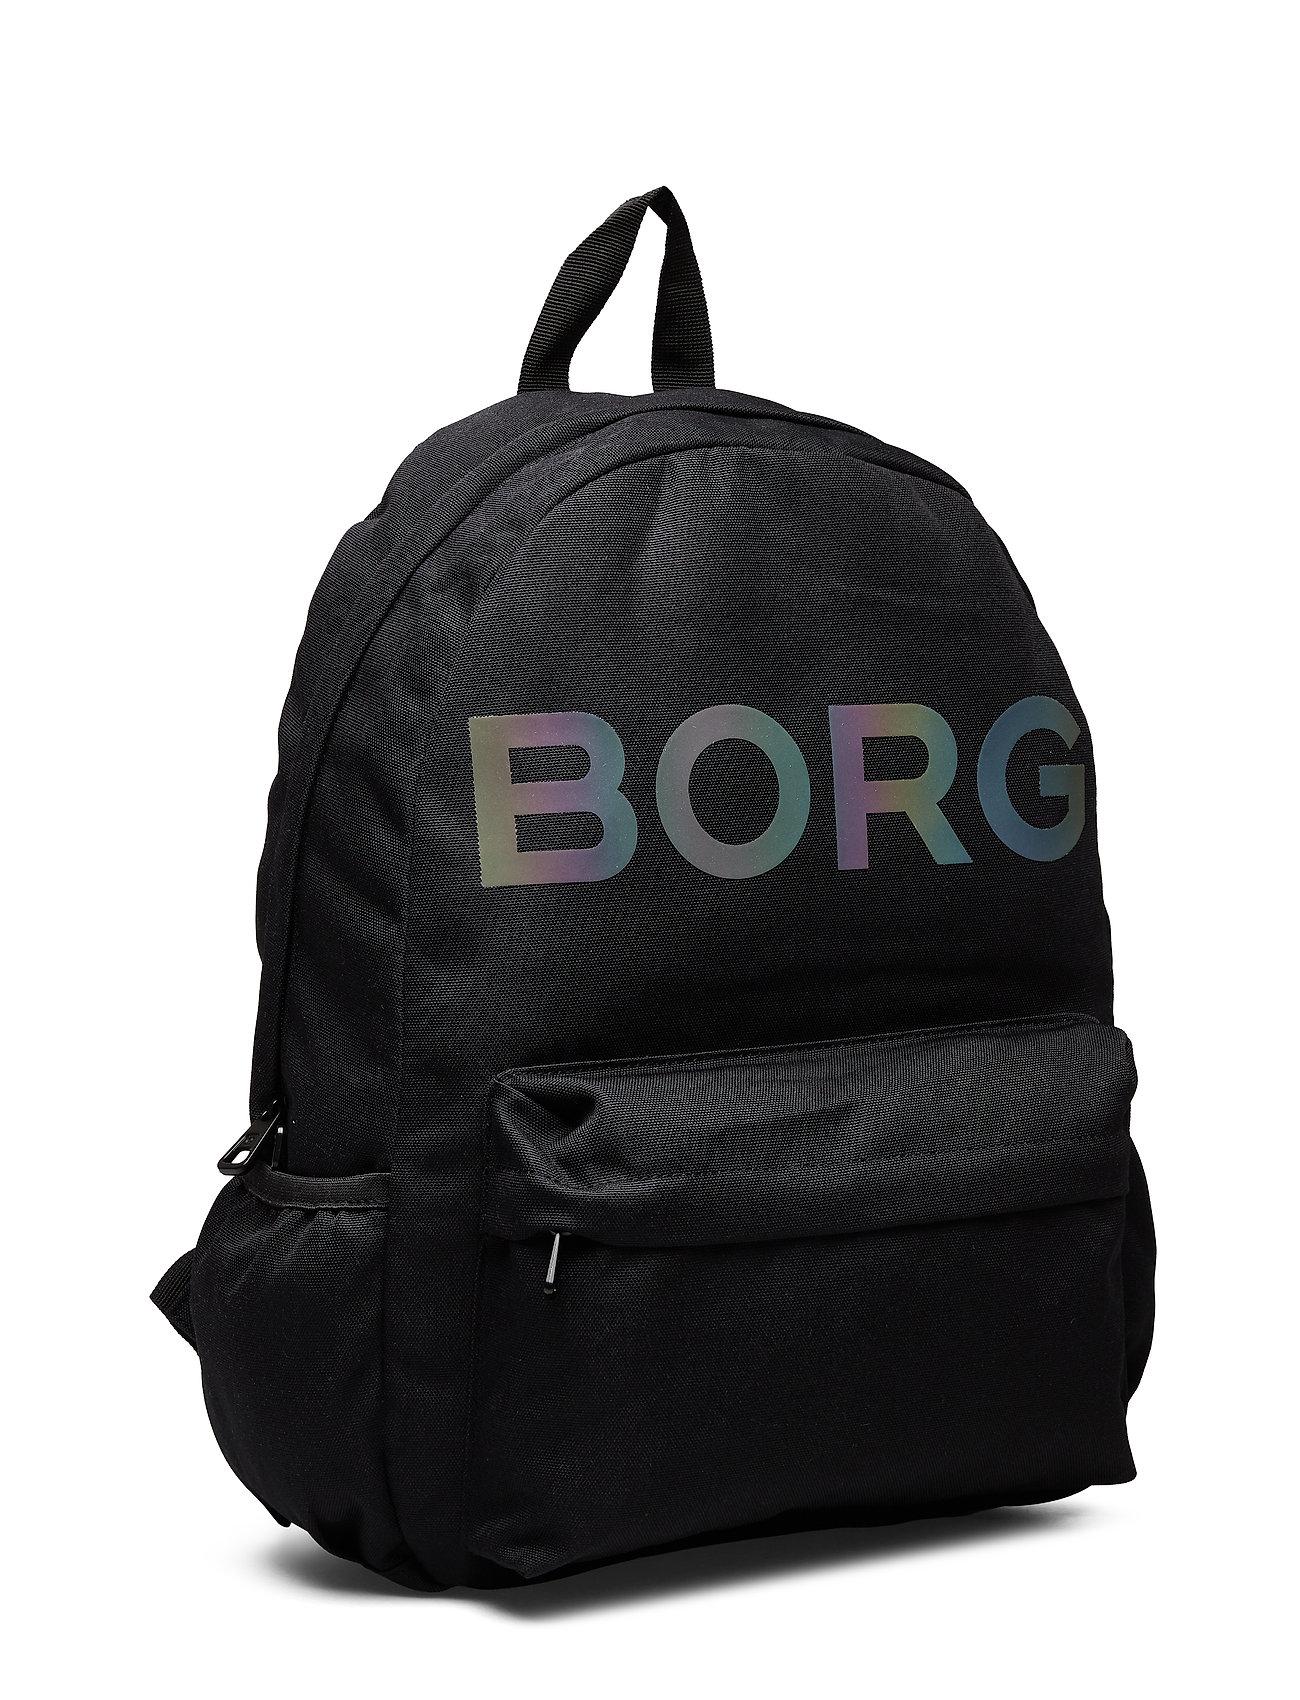 Borg Borg VanessablackBjörn Bags VanessablackBjörn Borg VanessablackBjörn Bags DYb2WHIEe9